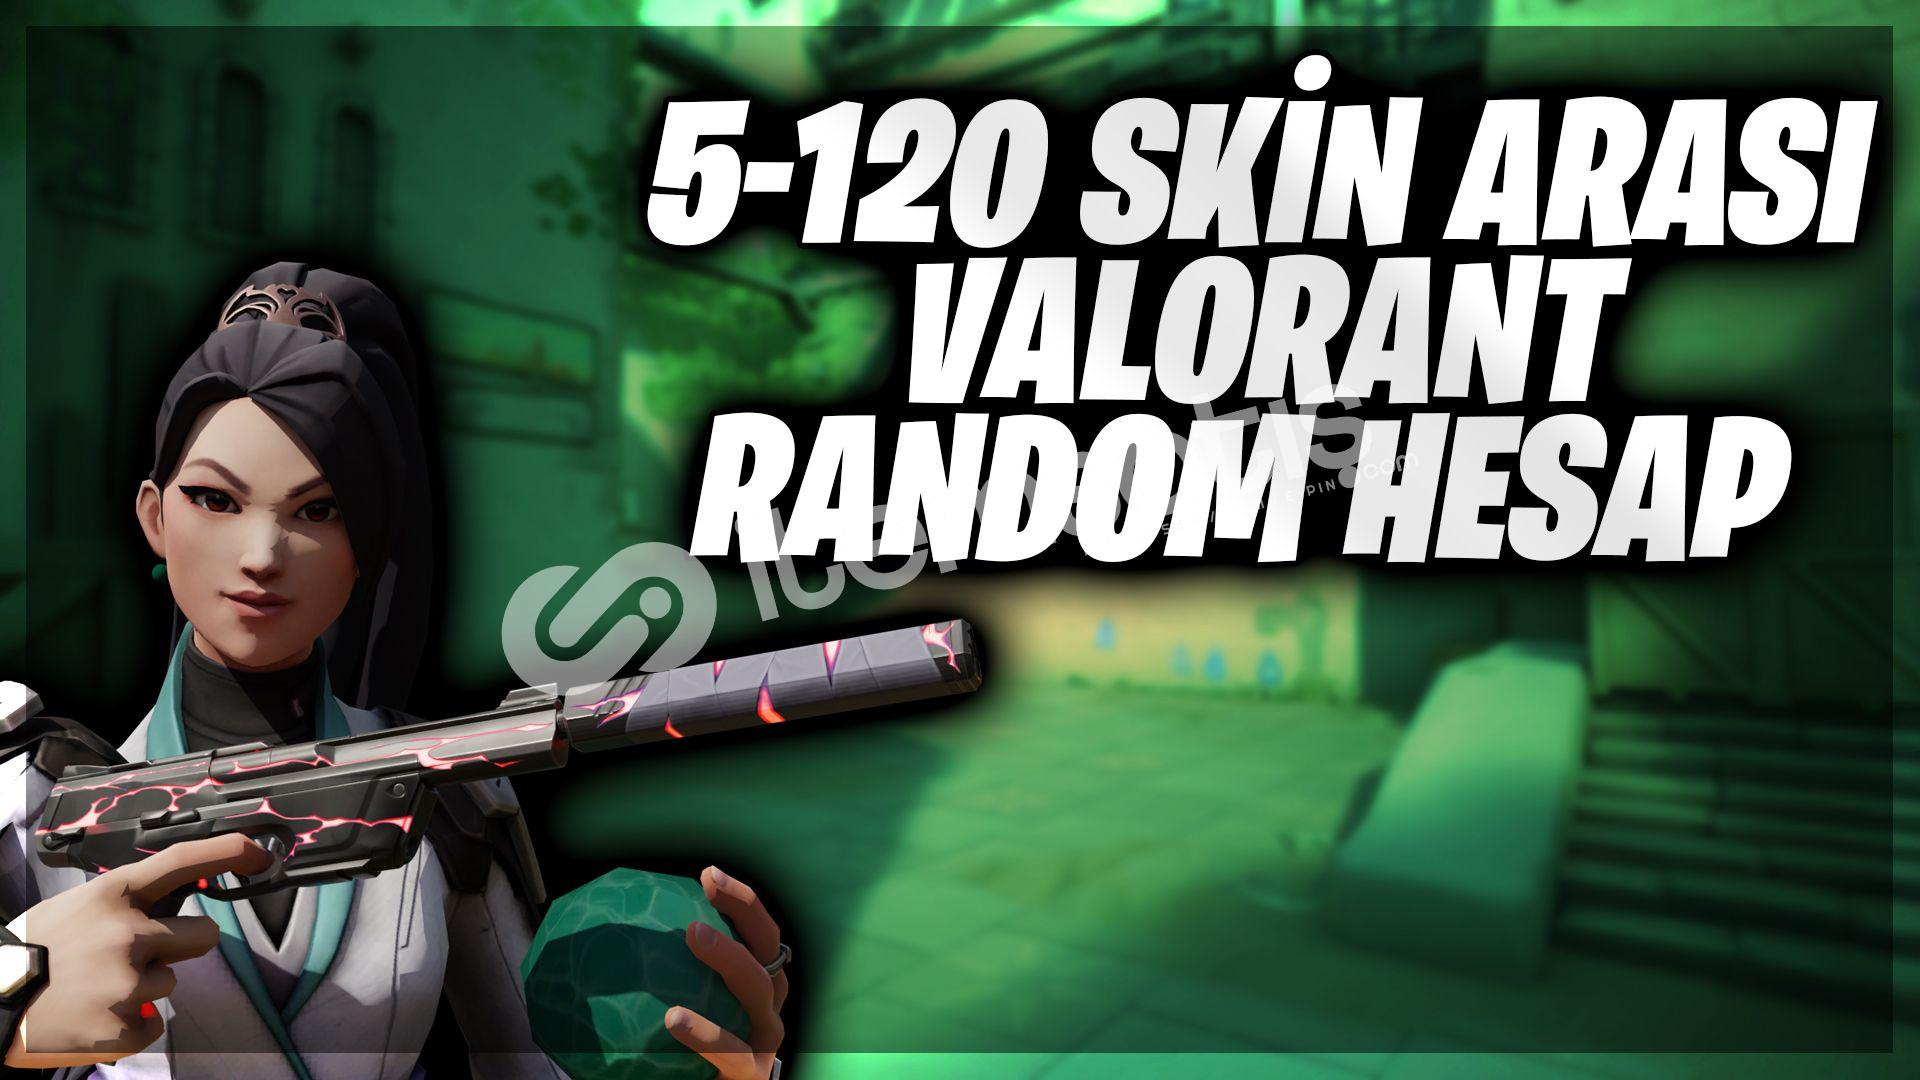 %100 TR 5-120 Random 5 Skin altı İade 1+1 Hediyelii